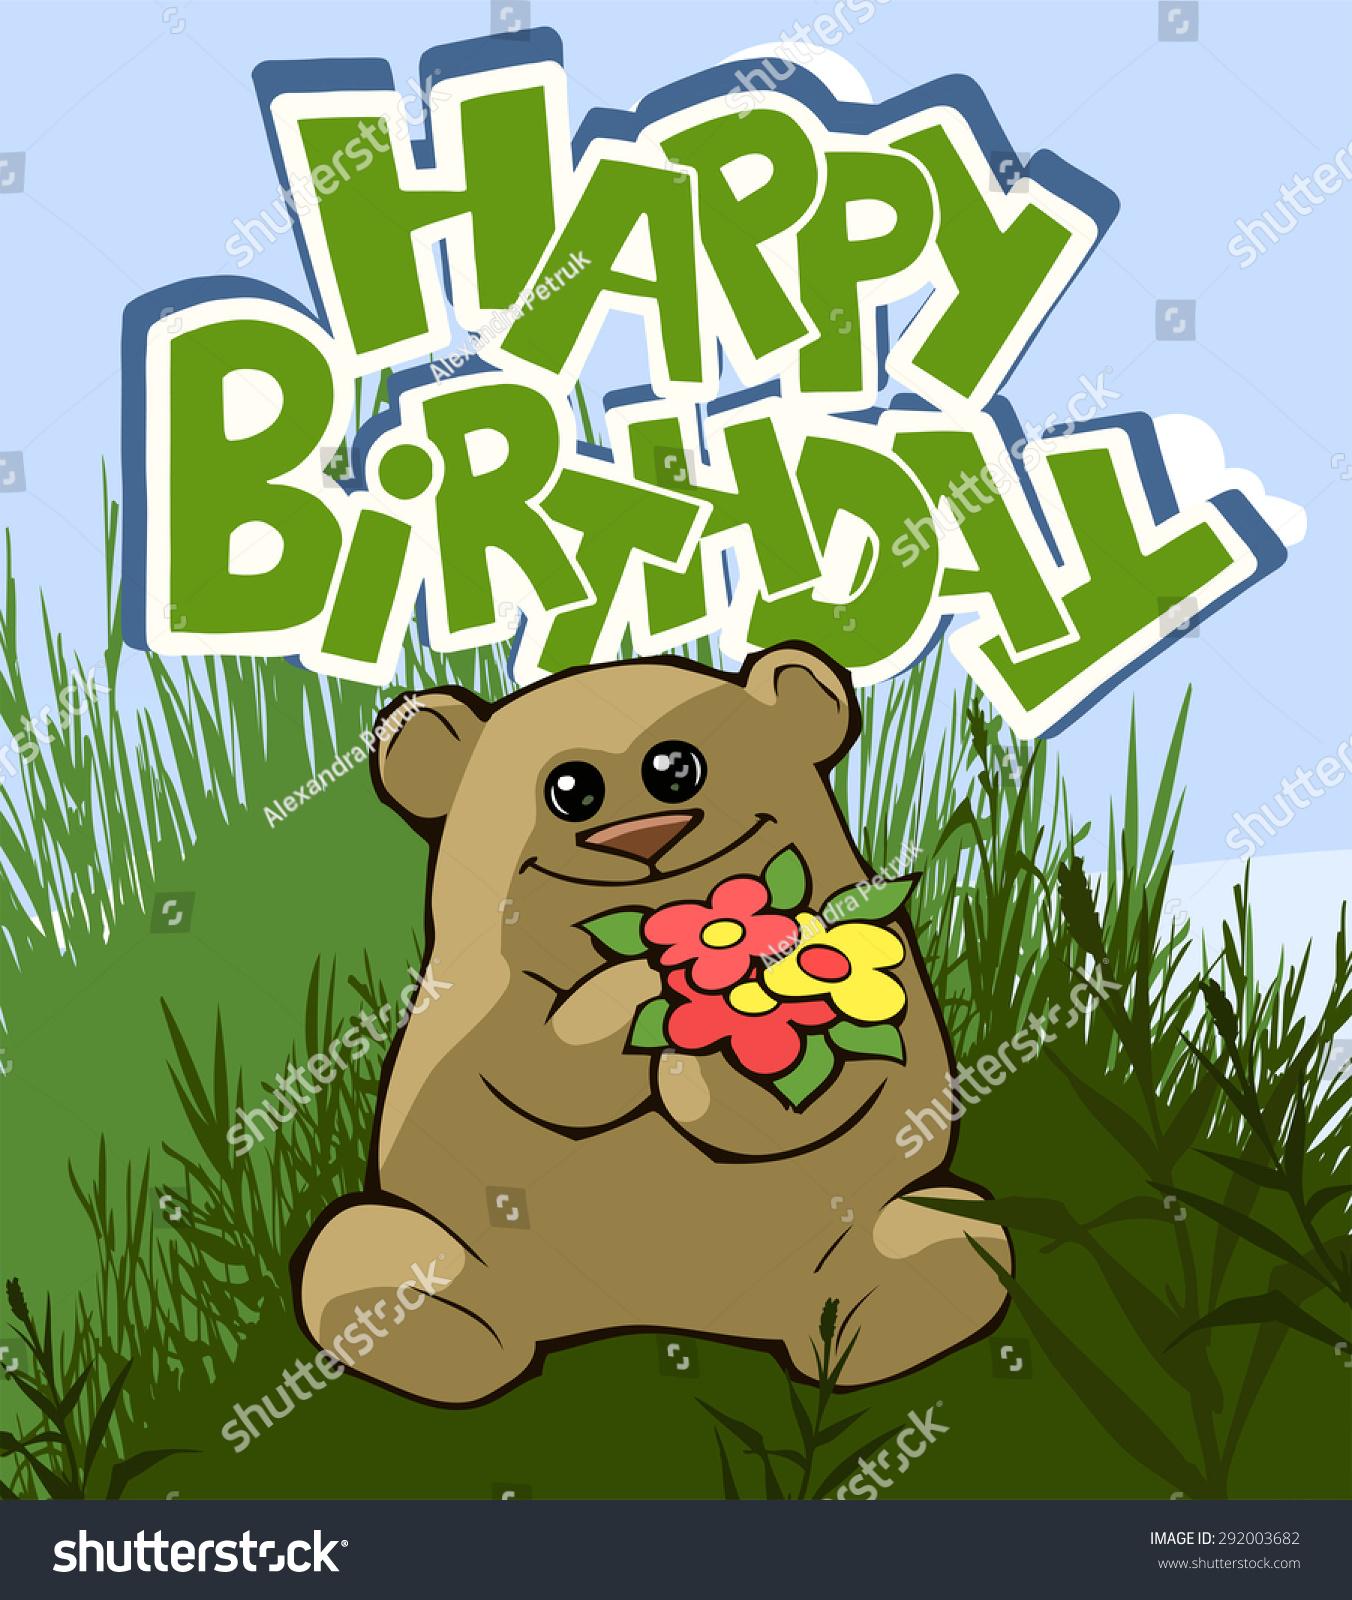 Happy birthday greeting card teddy bear stock vector hd royalty happy birthday greeting card with a teddy bear holding flowers izmirmasajfo